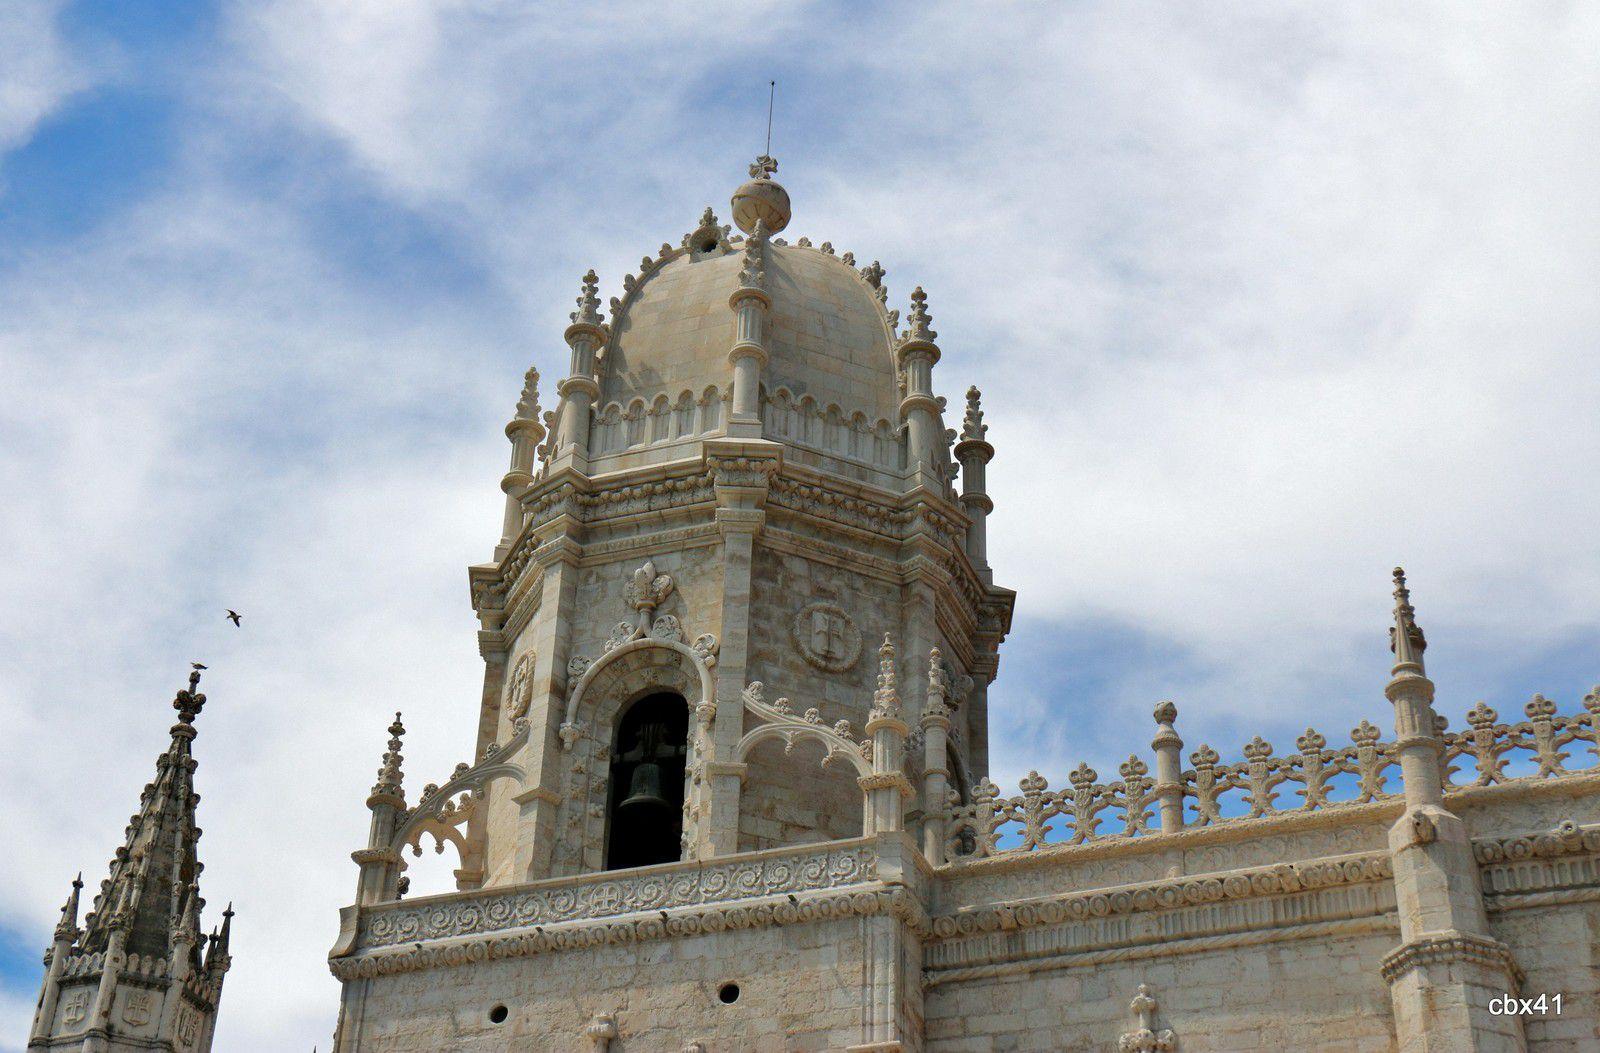 Monastère des Hiéronymites, Lisbonne (Poryugal)